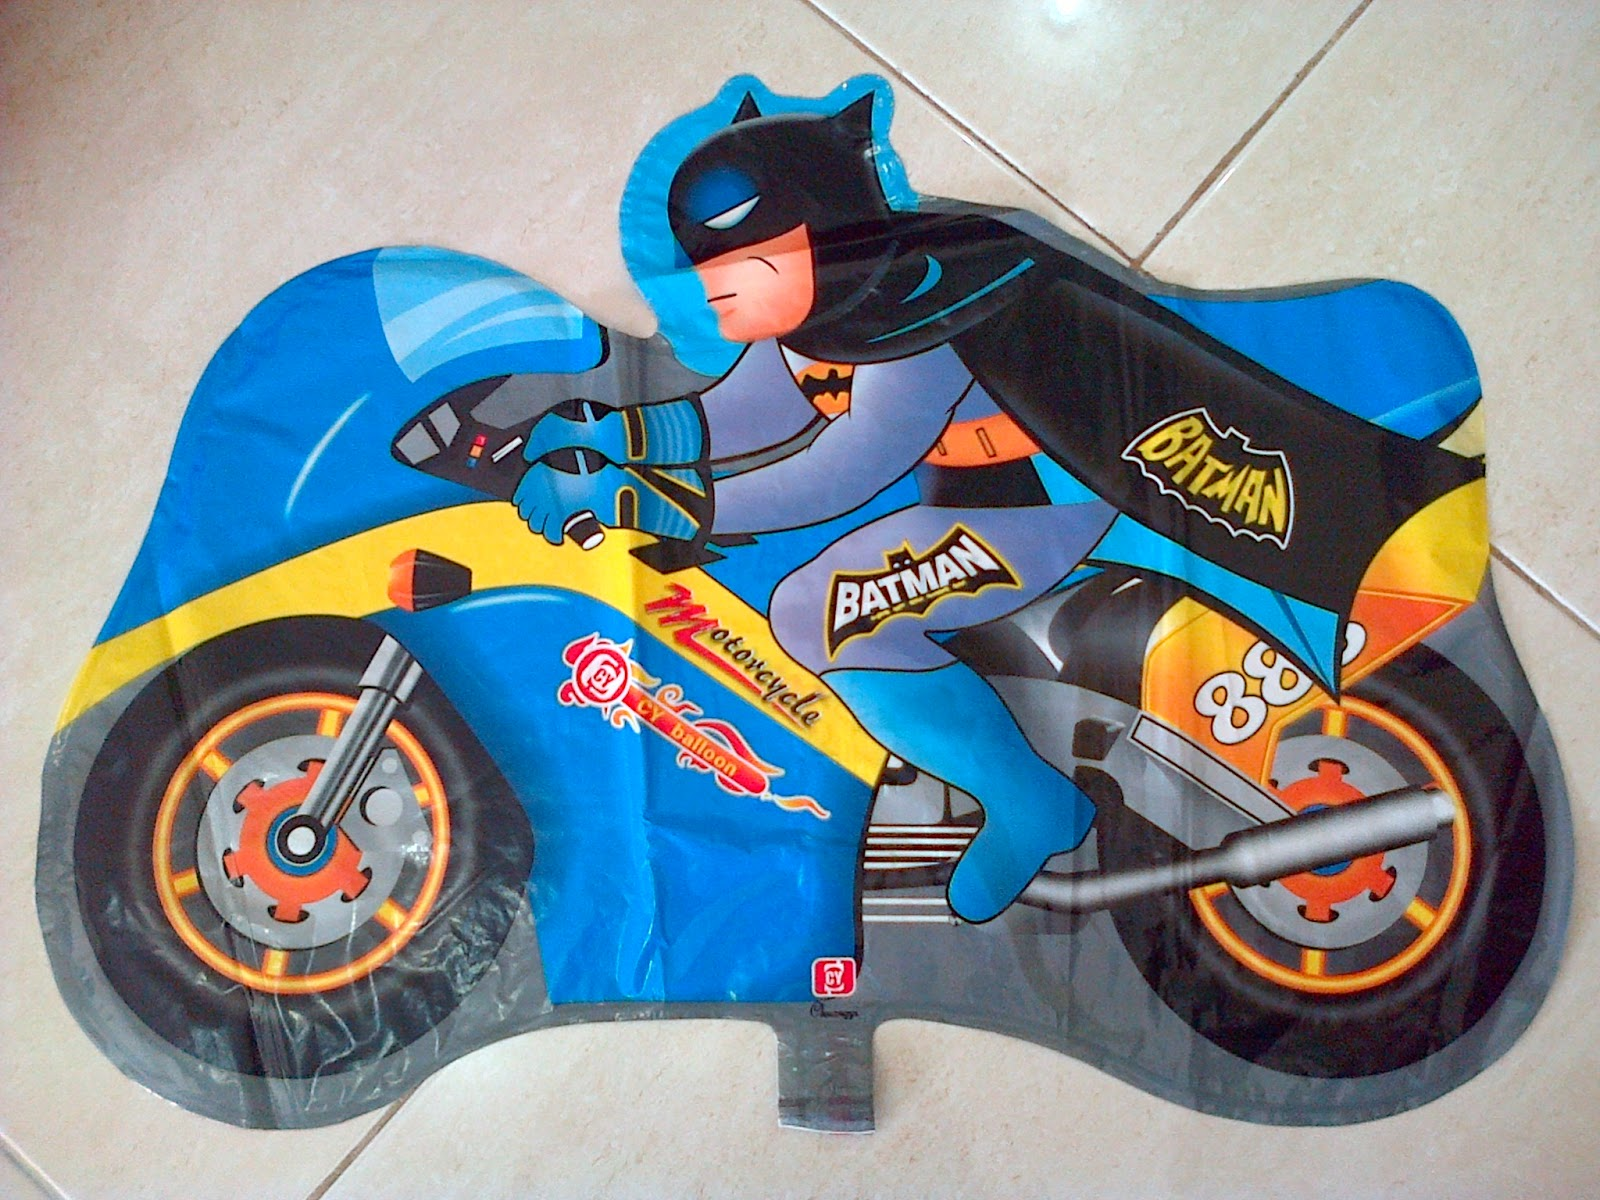 Balon Character Motor Batman Biru Anugerah Utama Toys Motif Ultraman